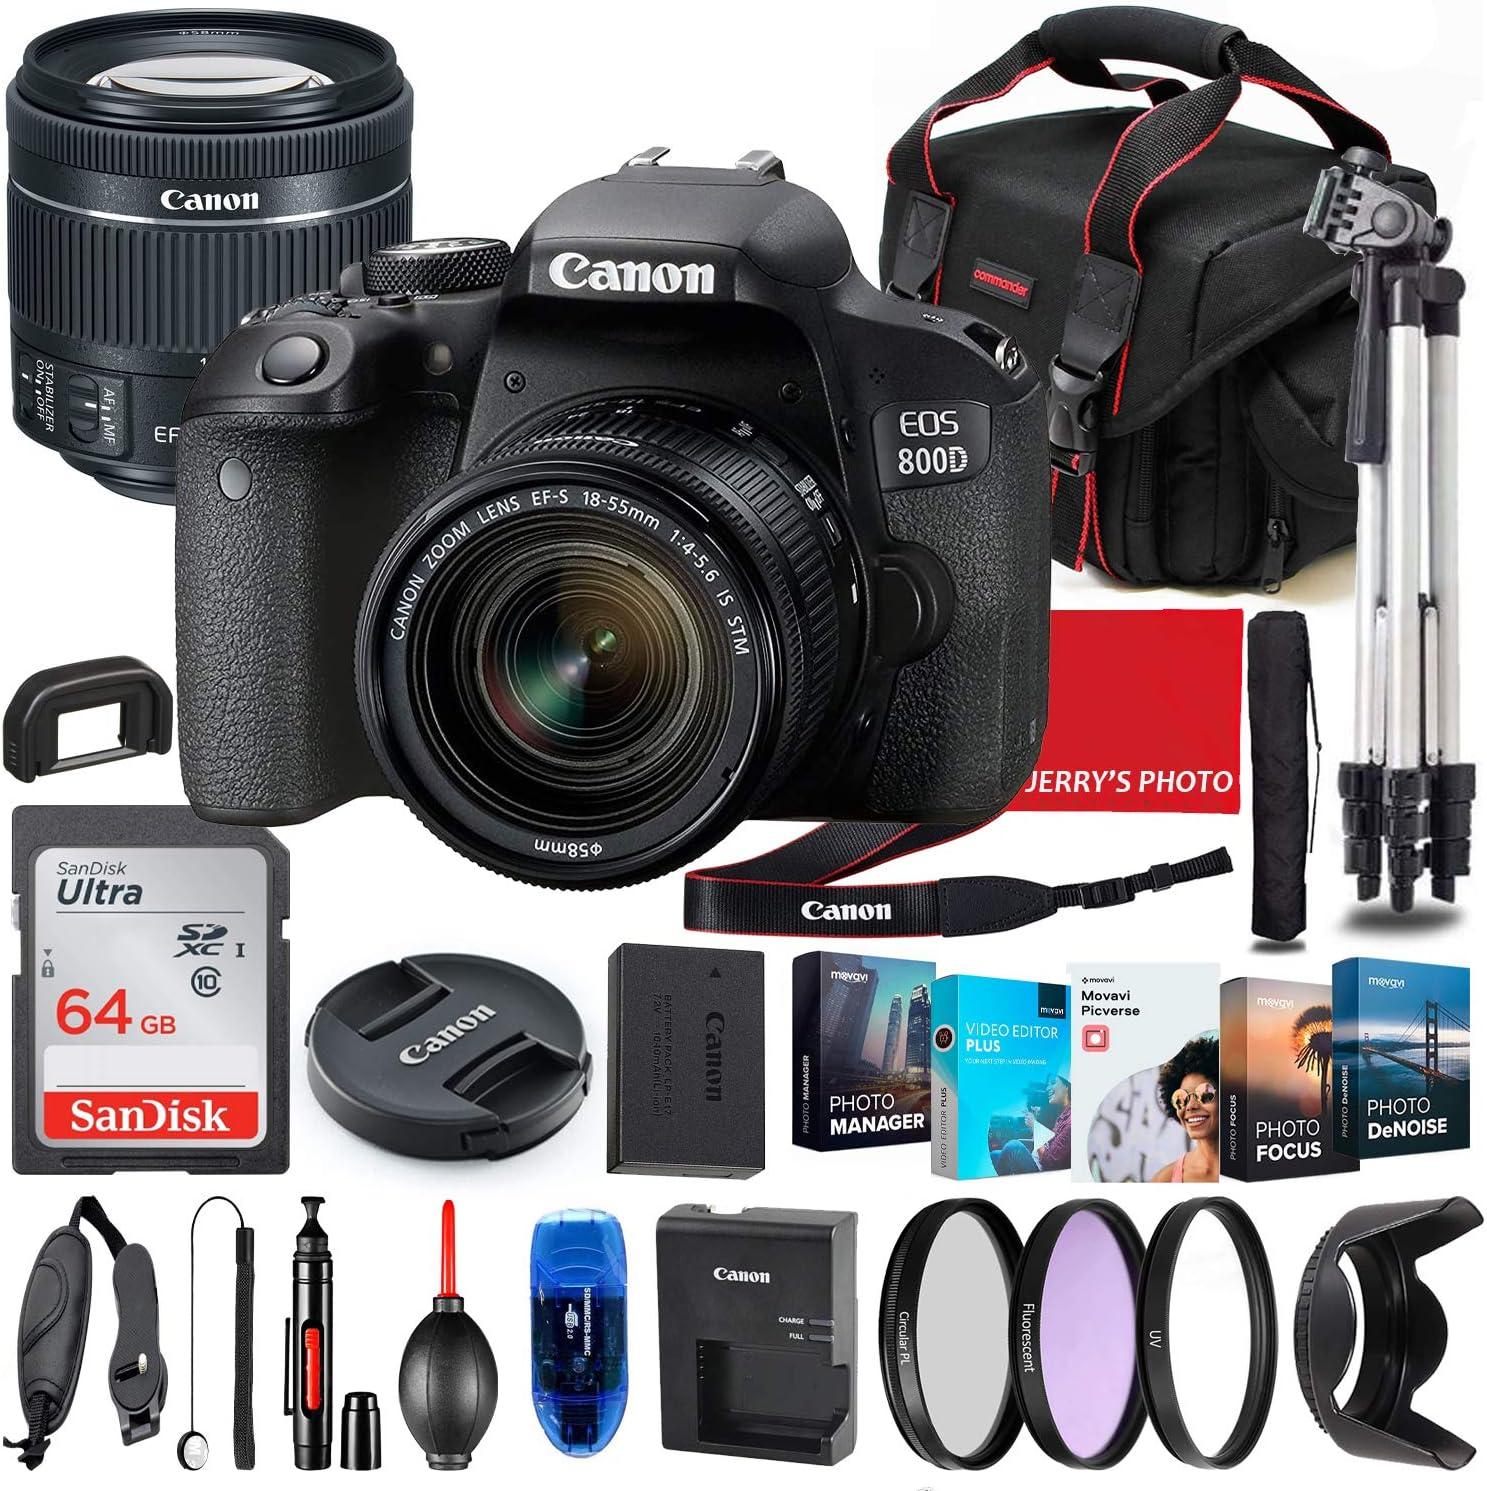 Canon EOS Ranking Super-cheap TOP8 800D Rebel T7i DSLR with Camera STM Bun Lens 18-55mm